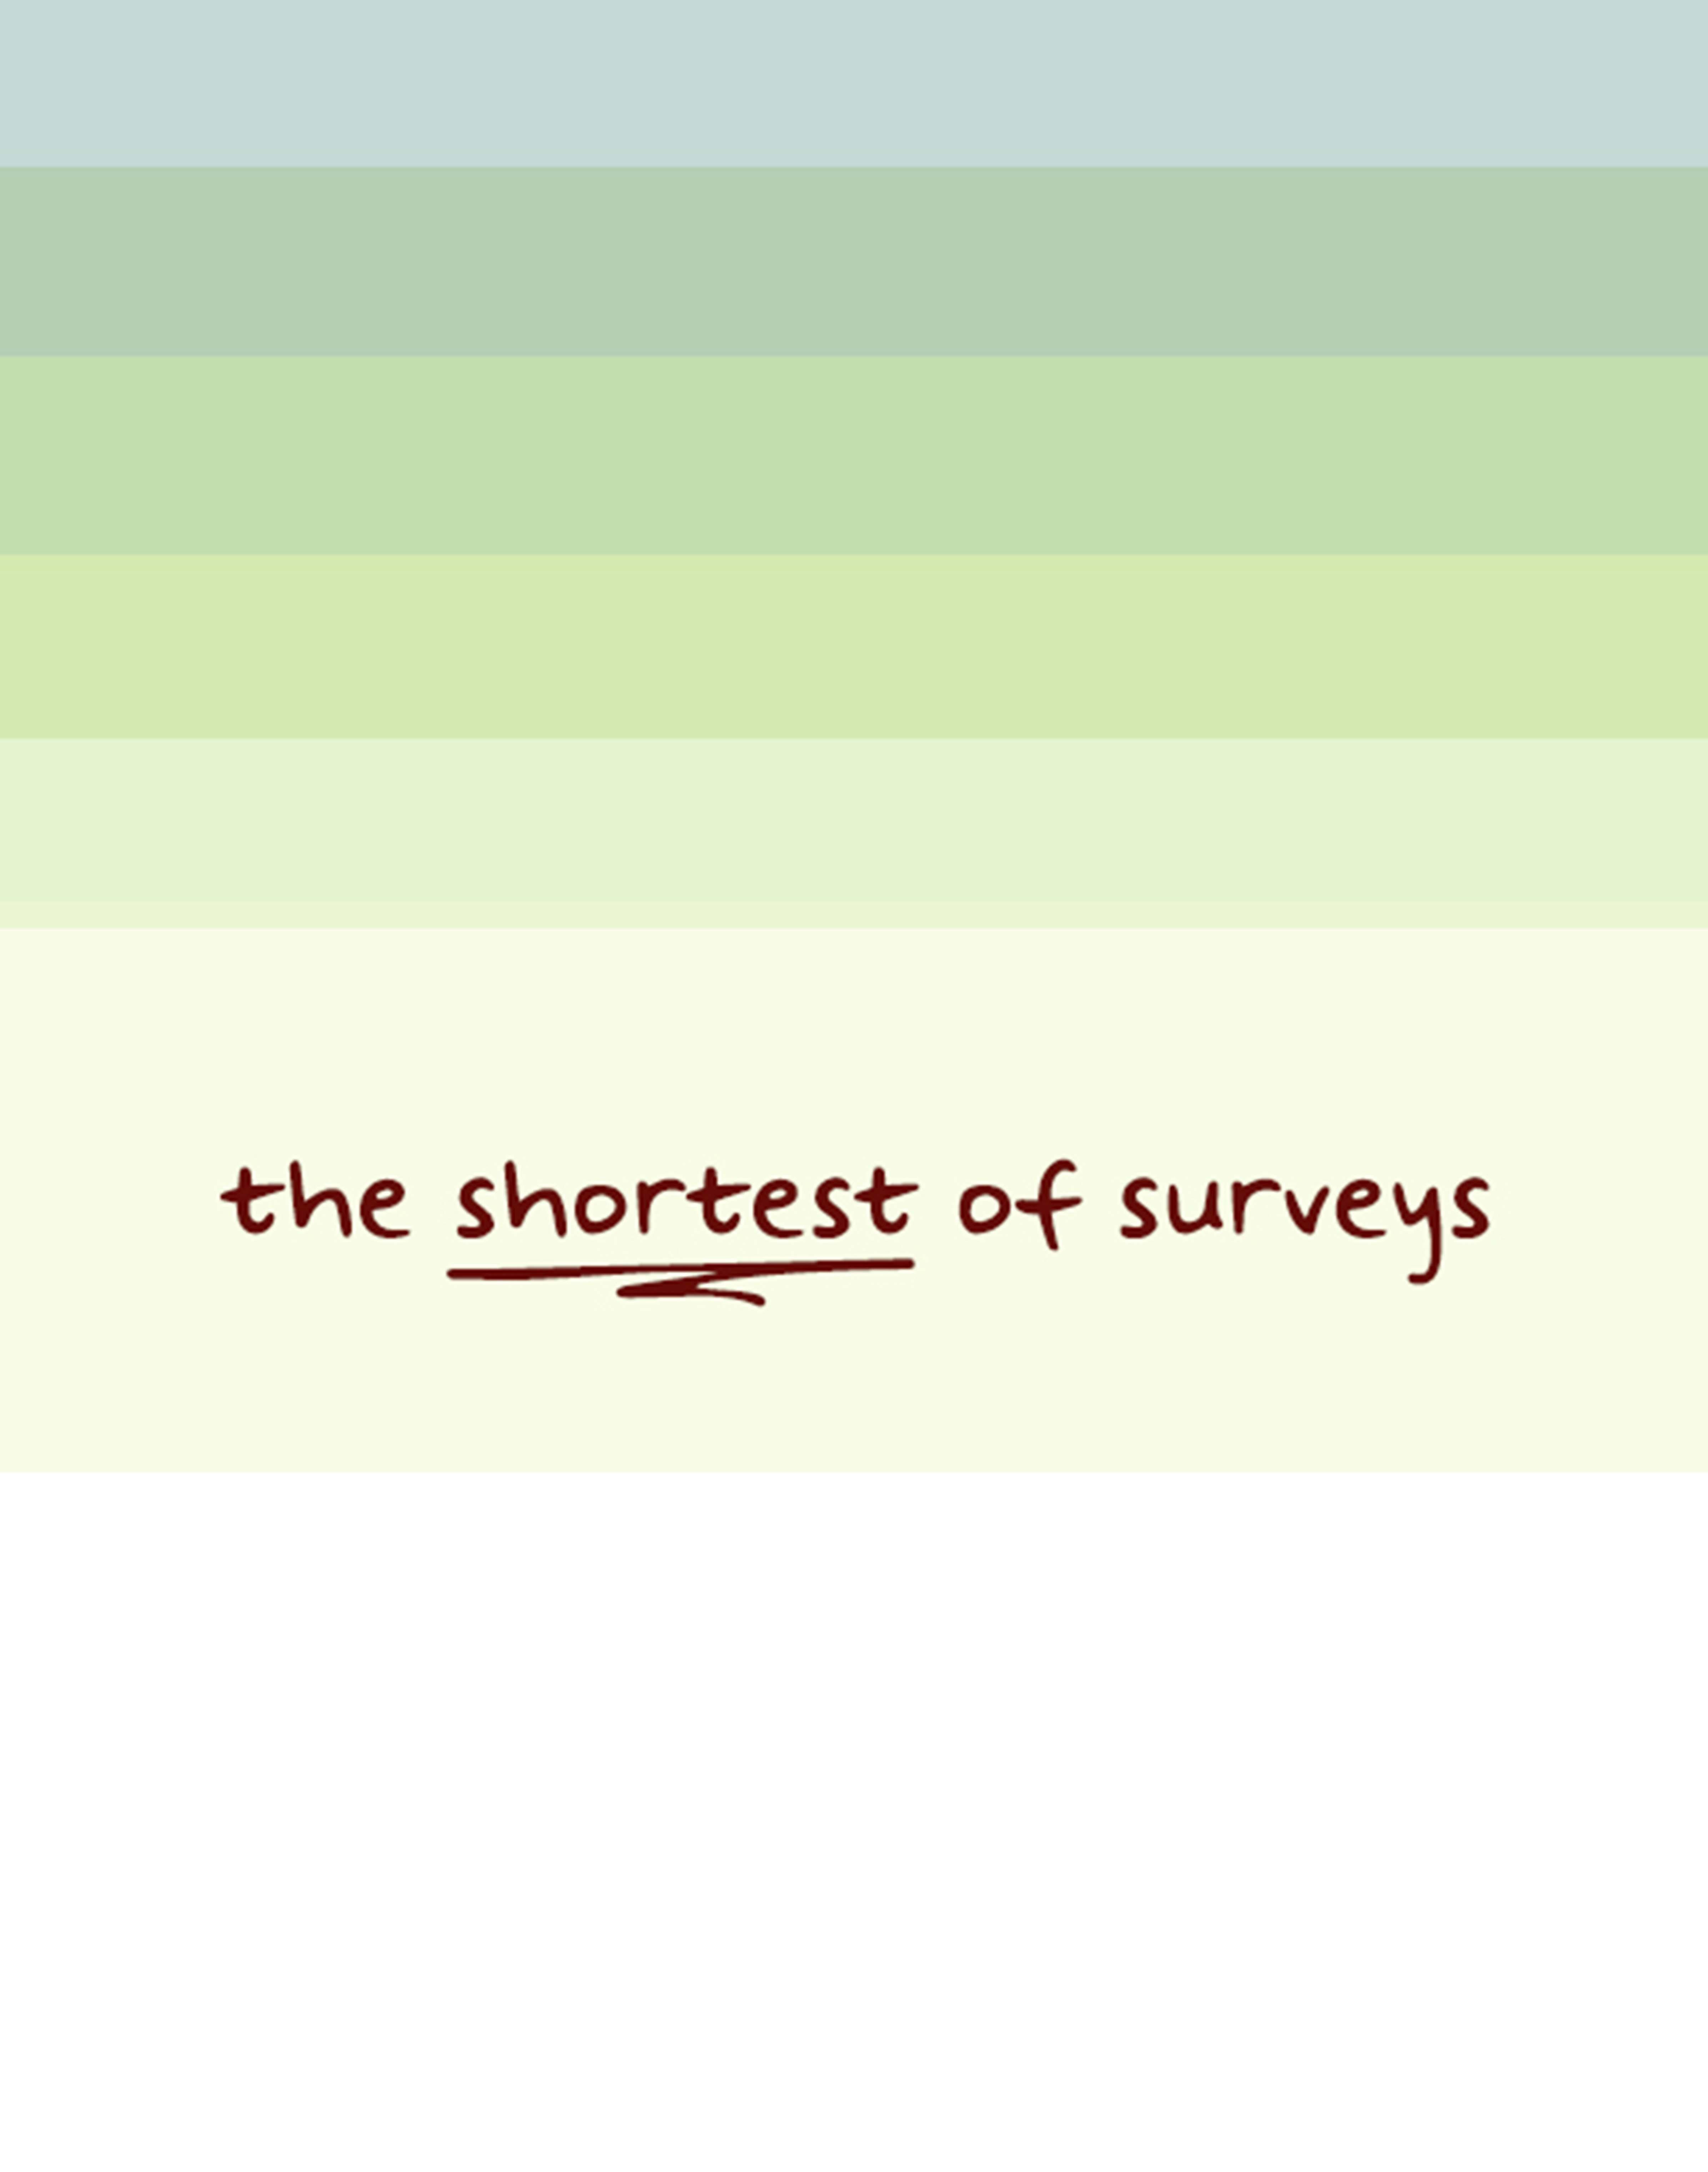 The Shortest of Surveys - website